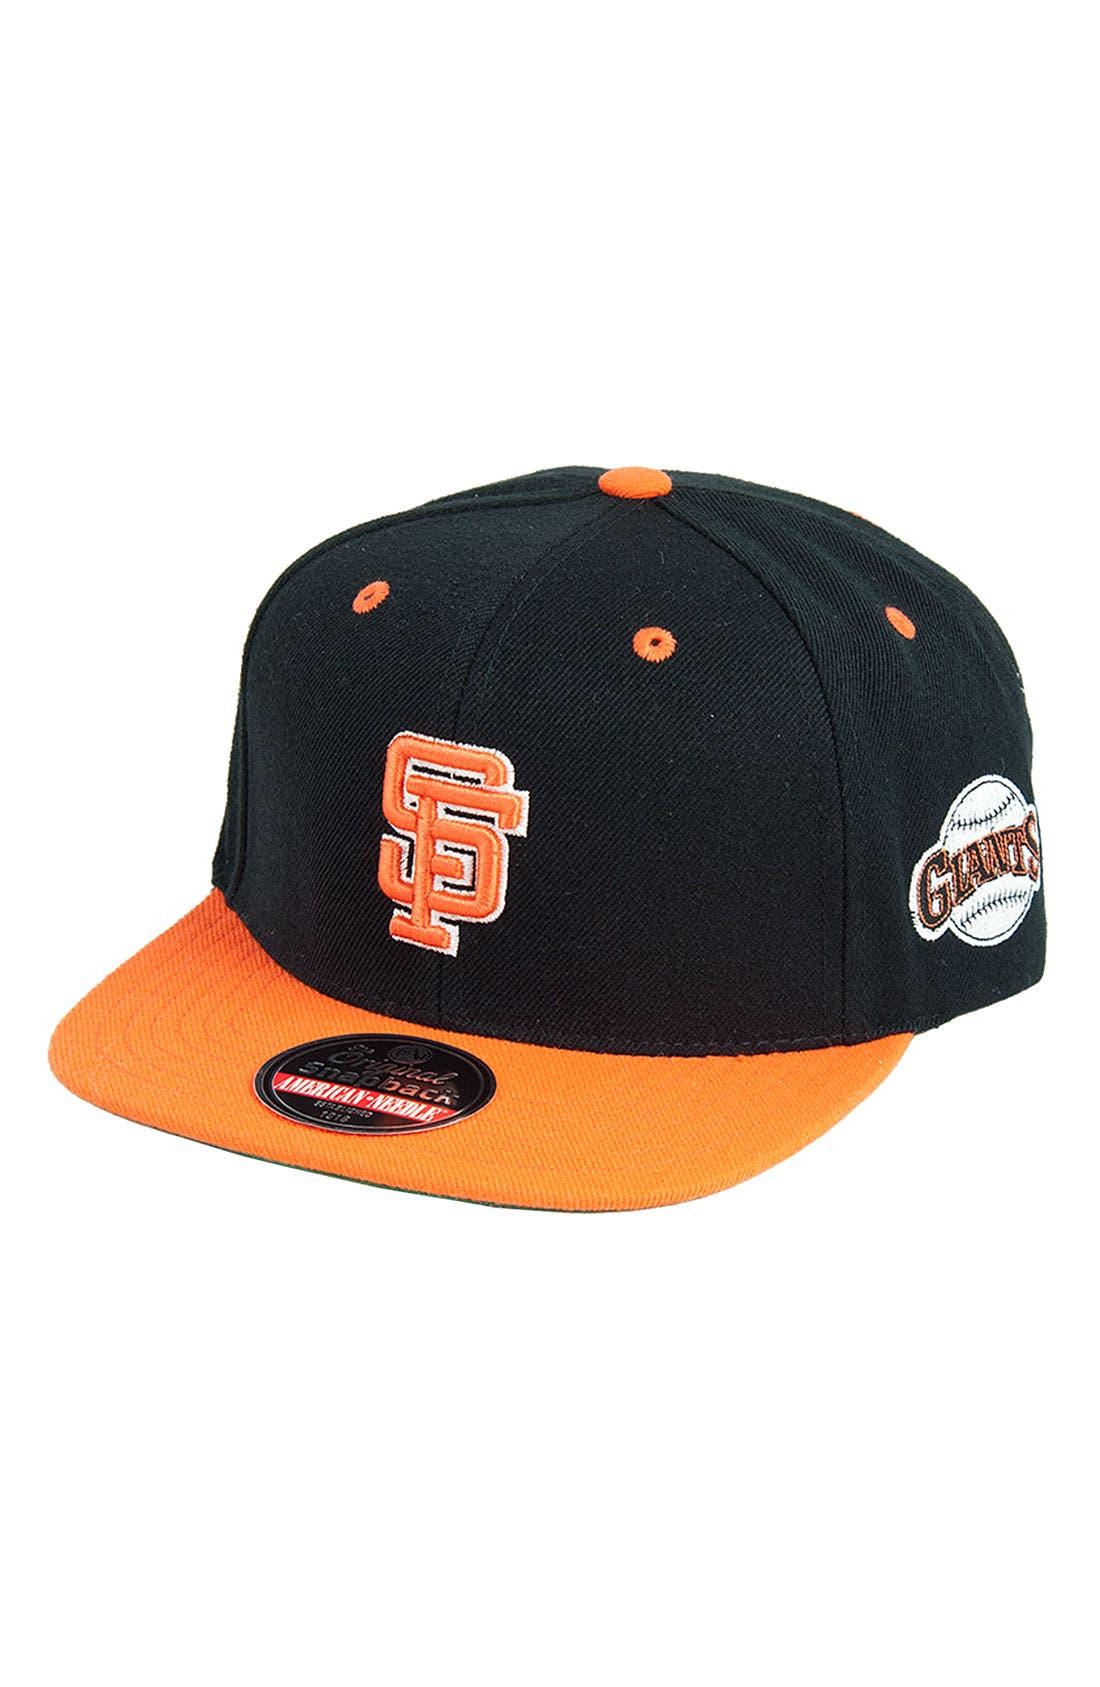 Main Image - American Needle 'Blockhead Giants' Snapback Baseball Cap